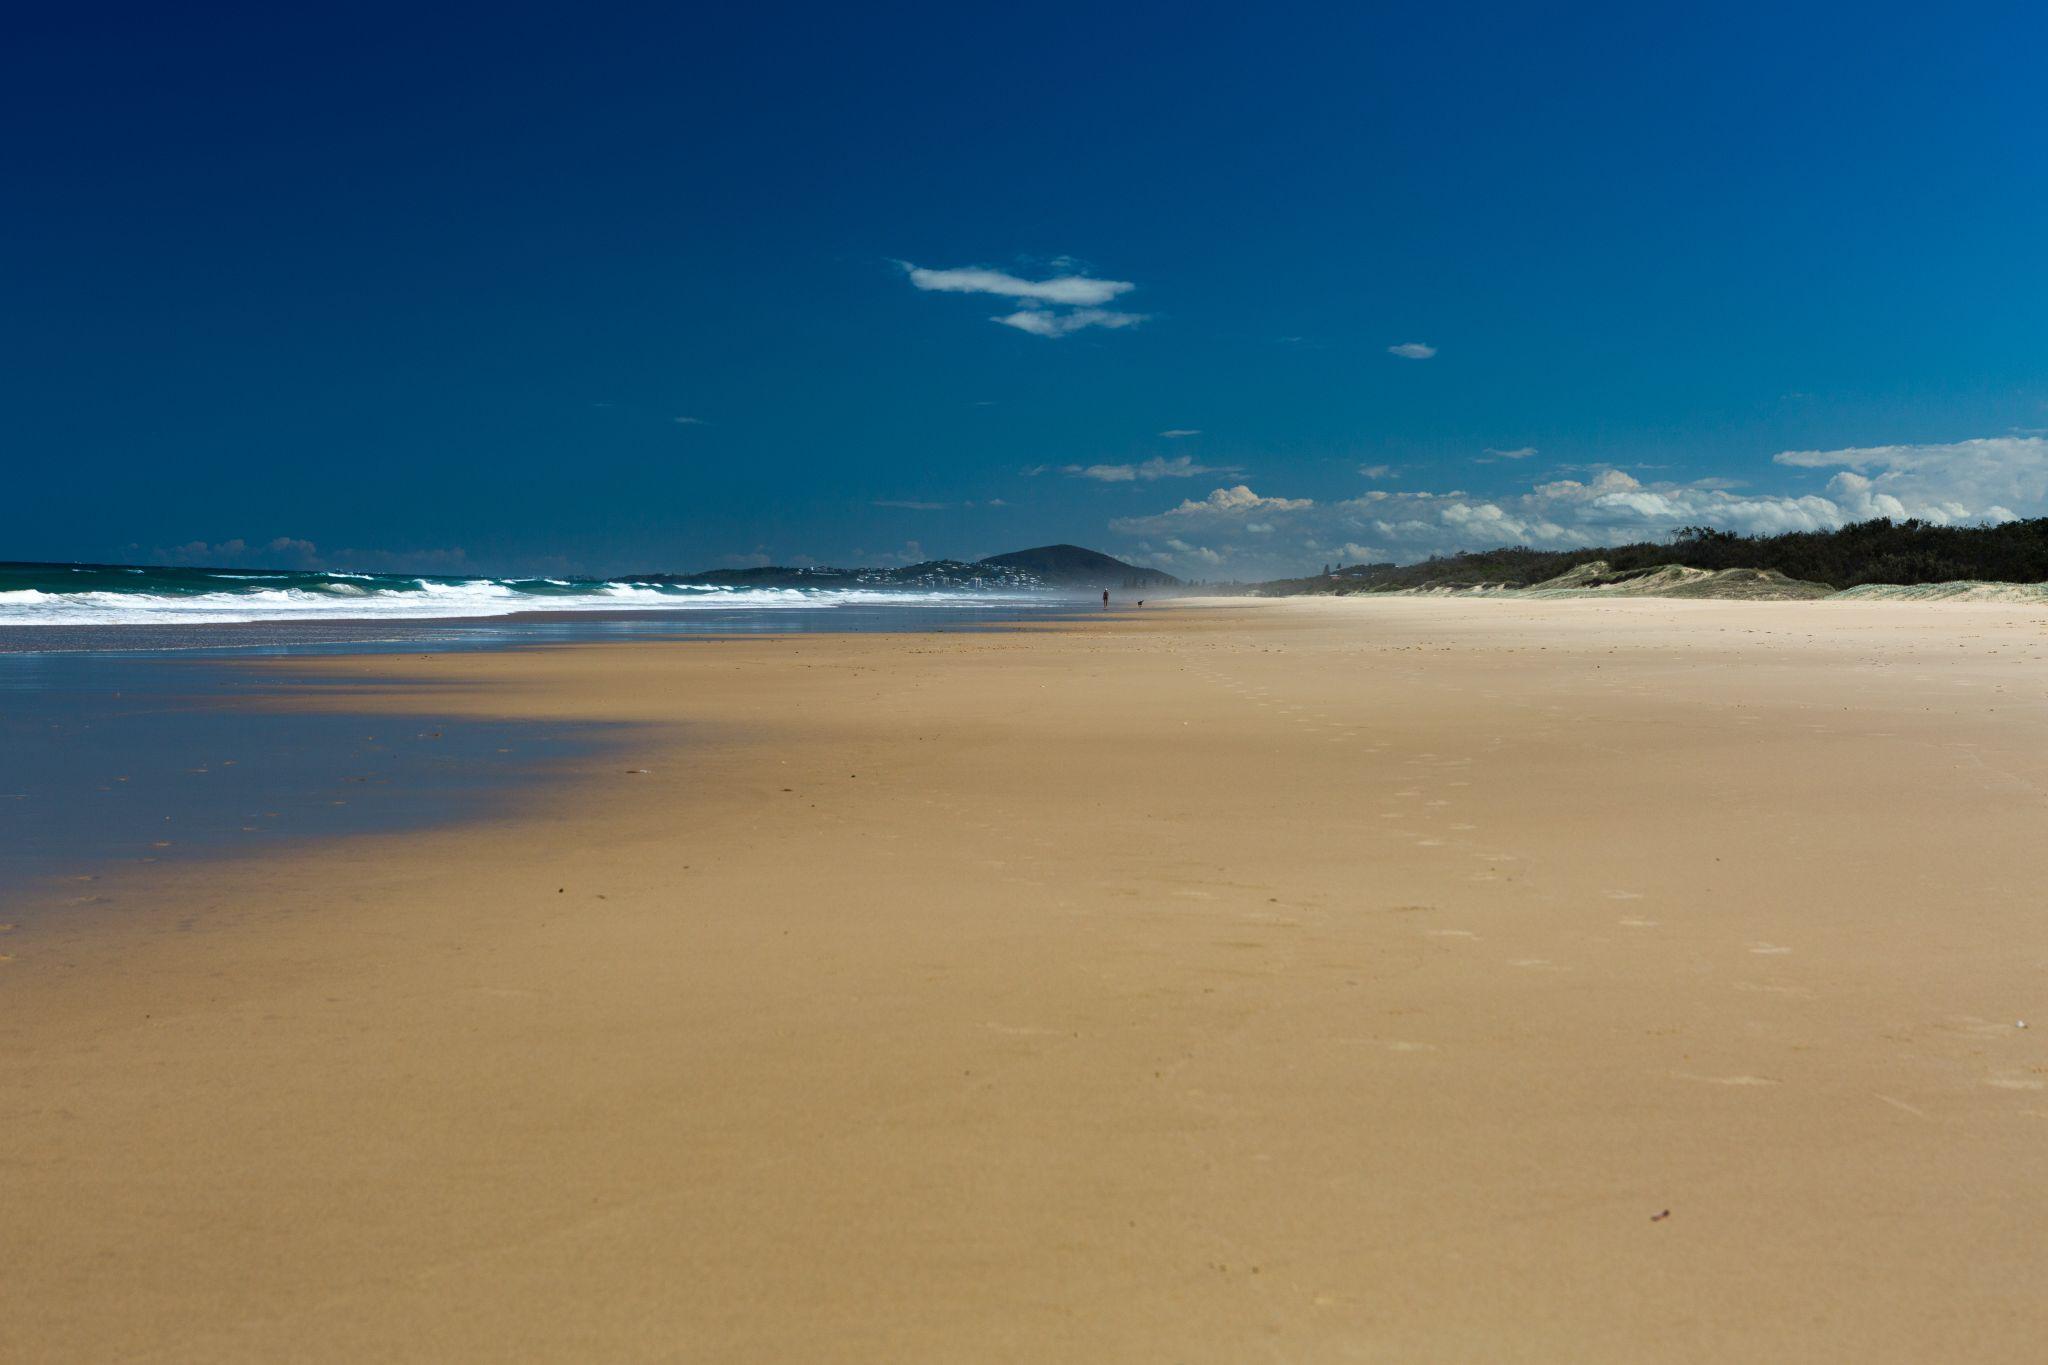 Castaway Beach, near Noosa National Park, Australia